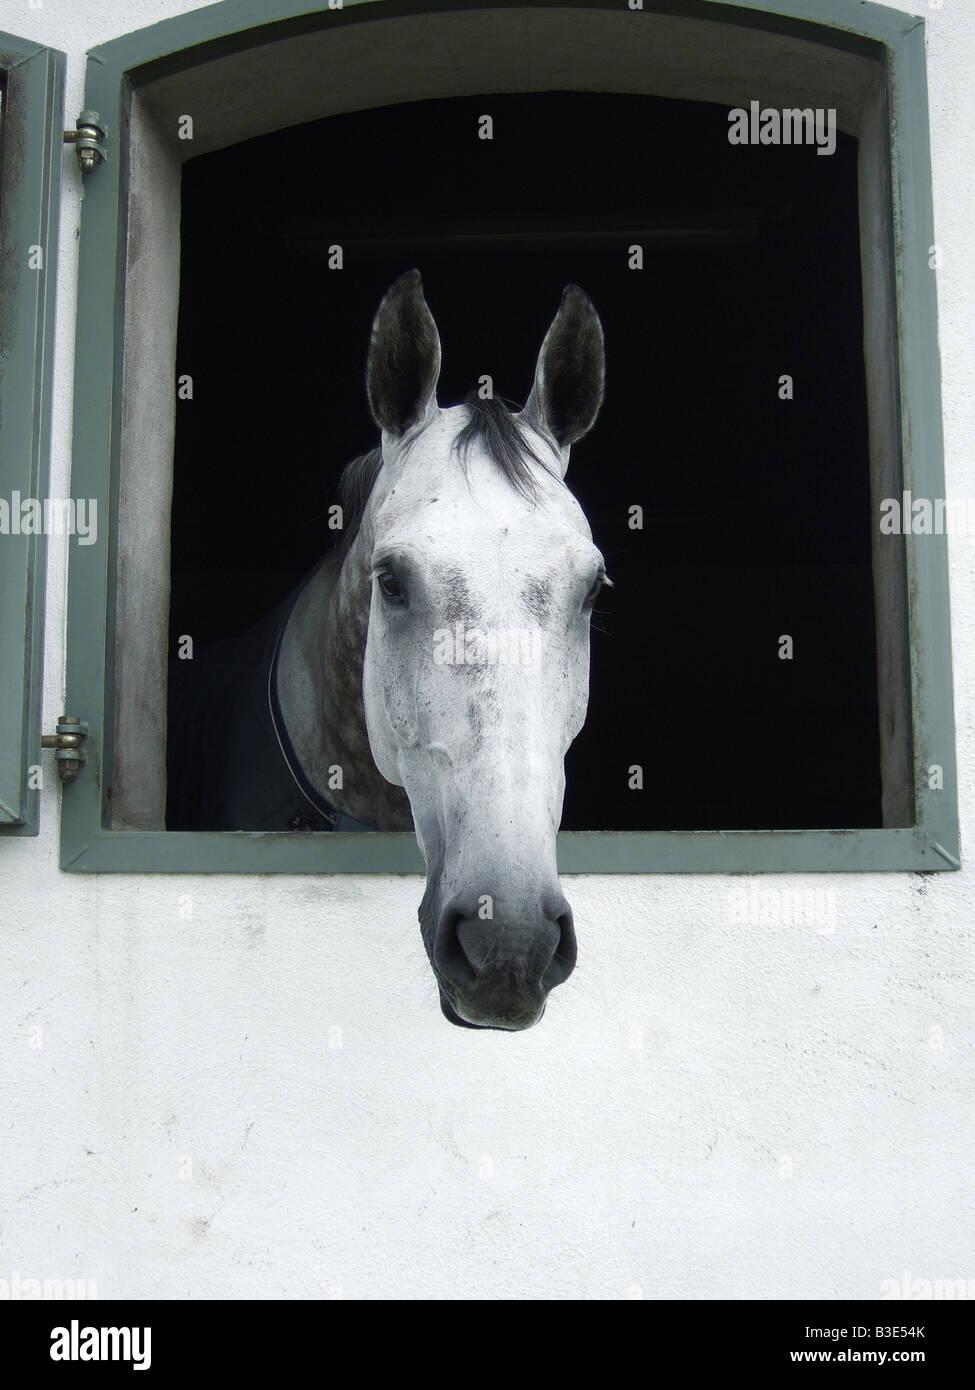 Ein Pferd aus dem stabilen Stall Fenster Stockbild